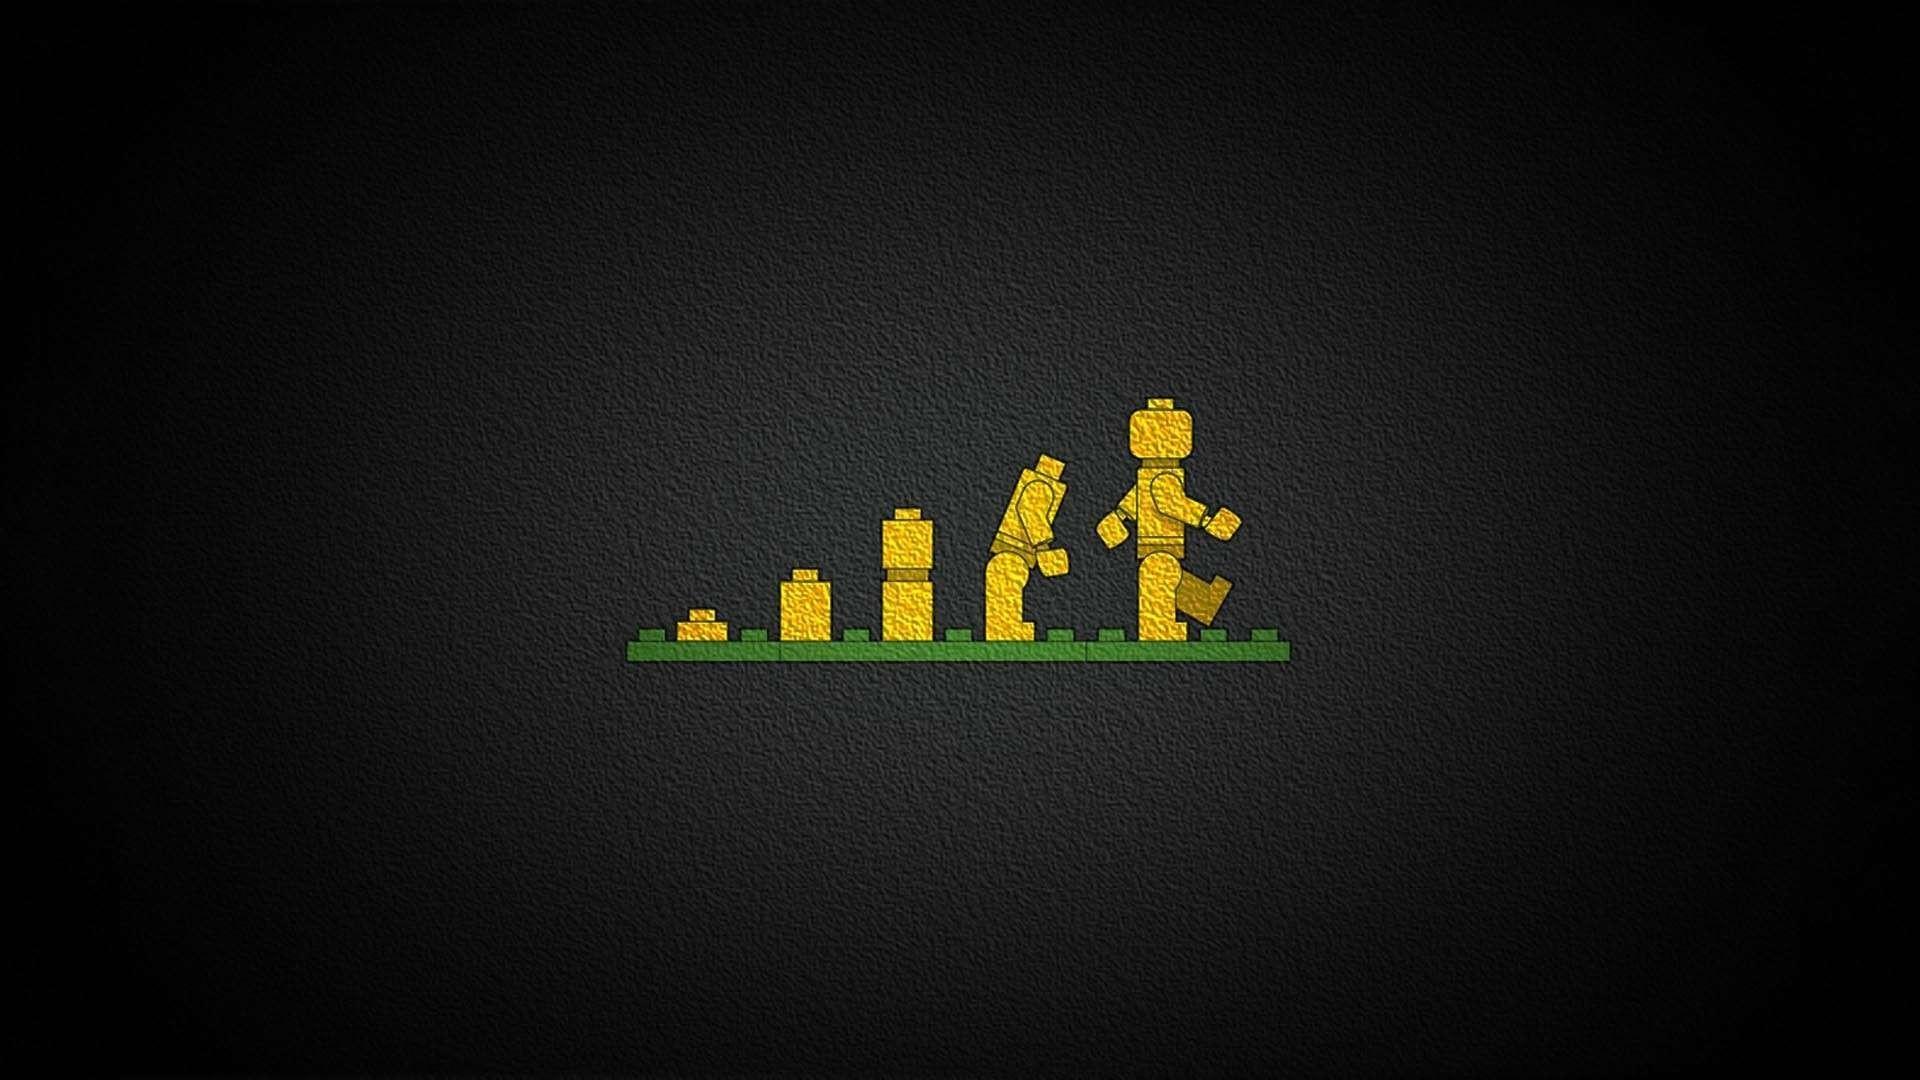 bricks childhood fun legos wallpaper 1920x1080 7427 WallpaperUP 1920x1080